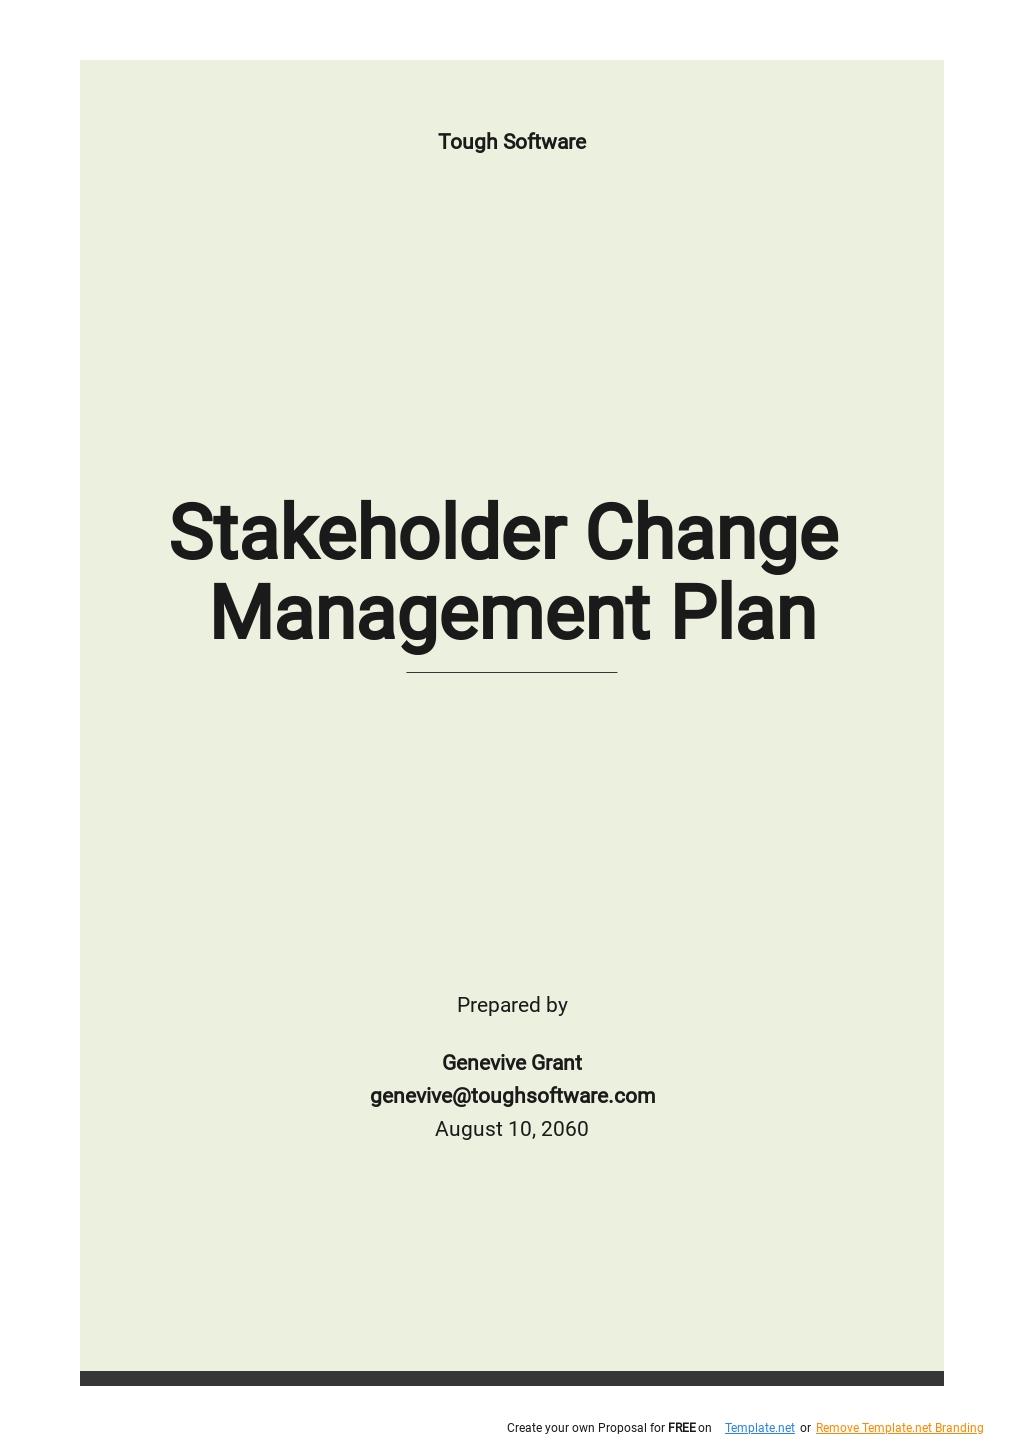 Stakeholder Change Management Plan Template .jpe